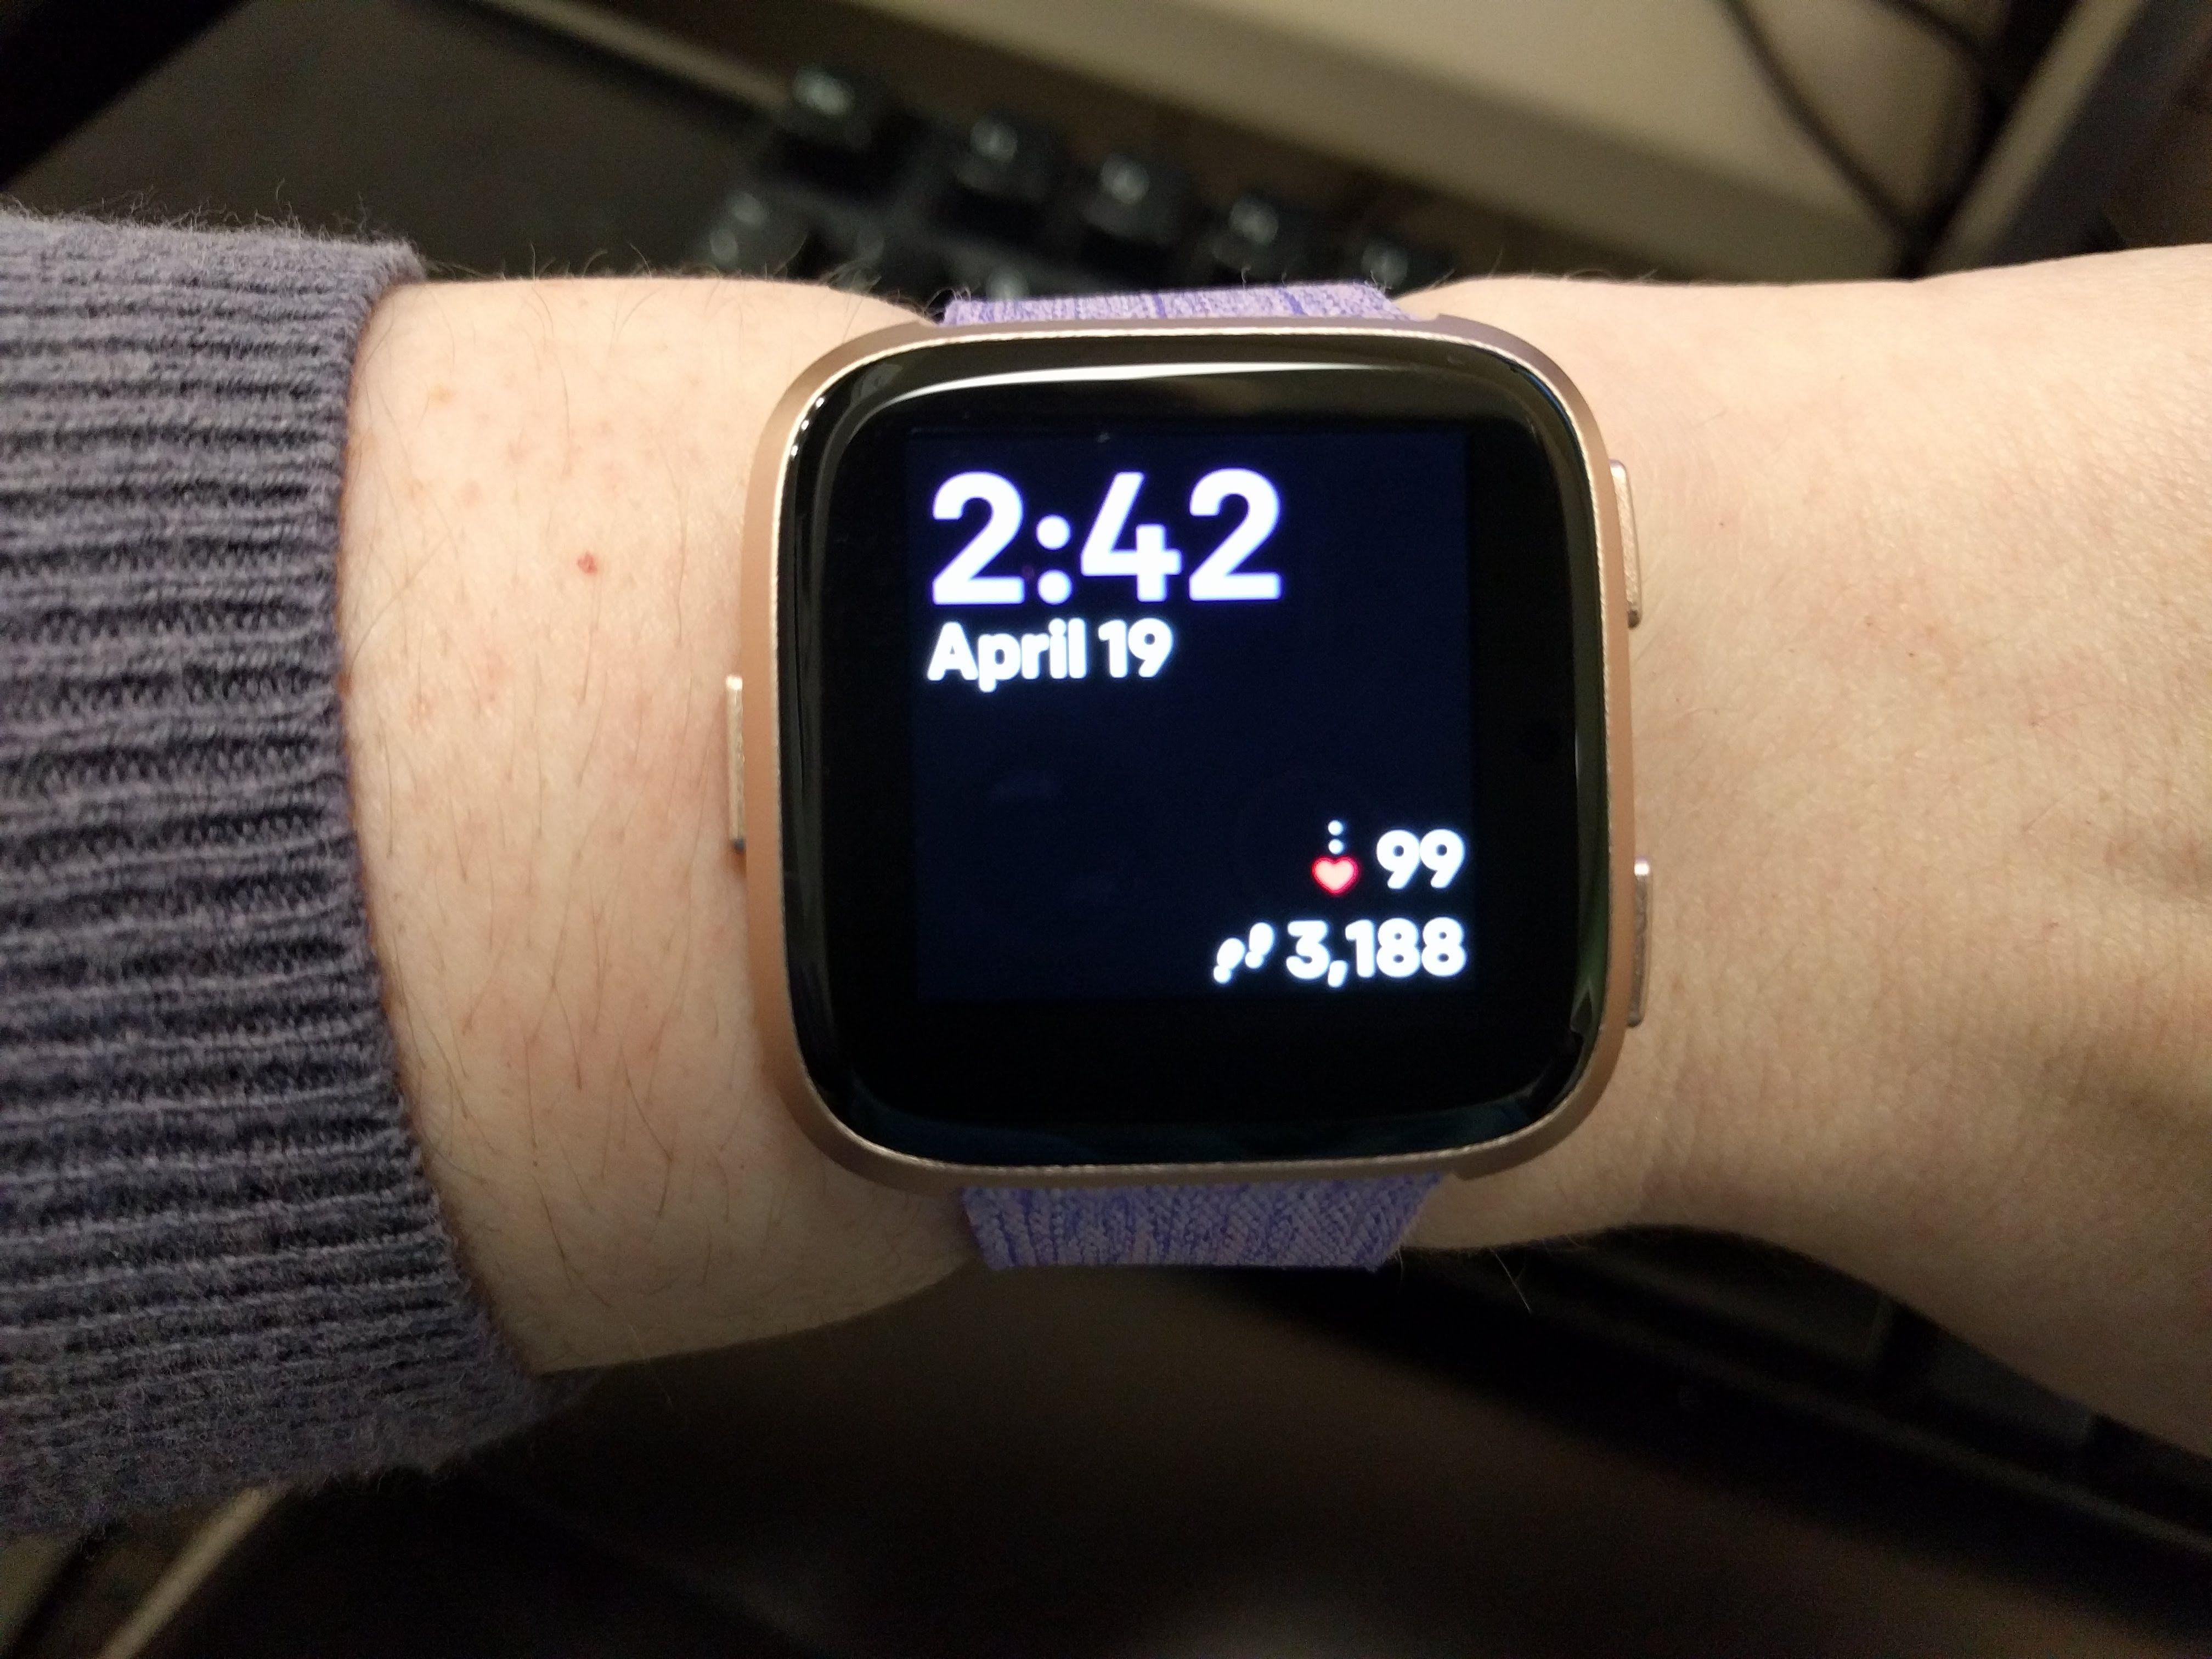 Show Me Your Clock Face Fitbit Community